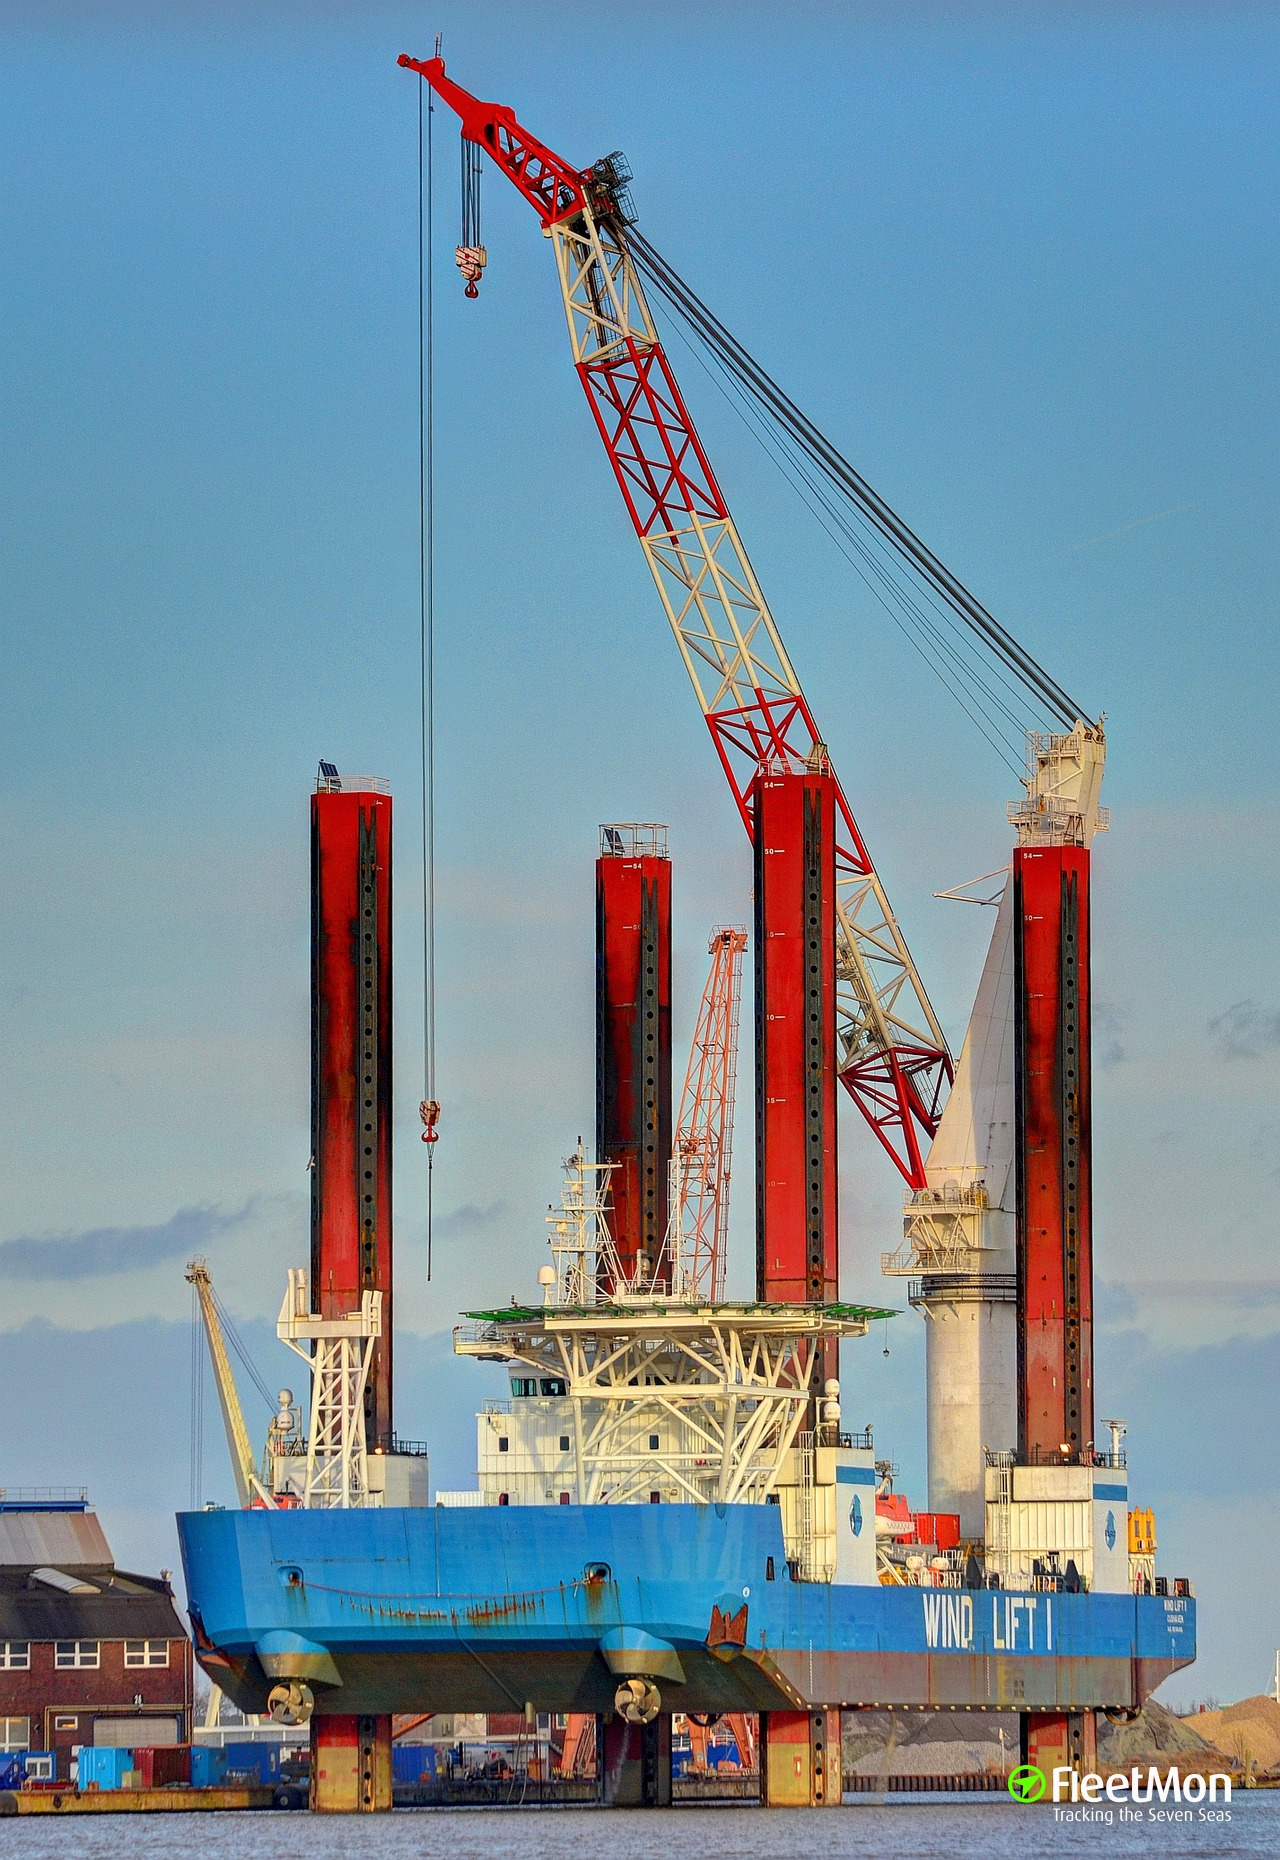 wind maintenance Estimating costs of operations and maintenance of offshore wind farms pj eecen, h braam, lwmm rademakers, ts obdam ecn wind.